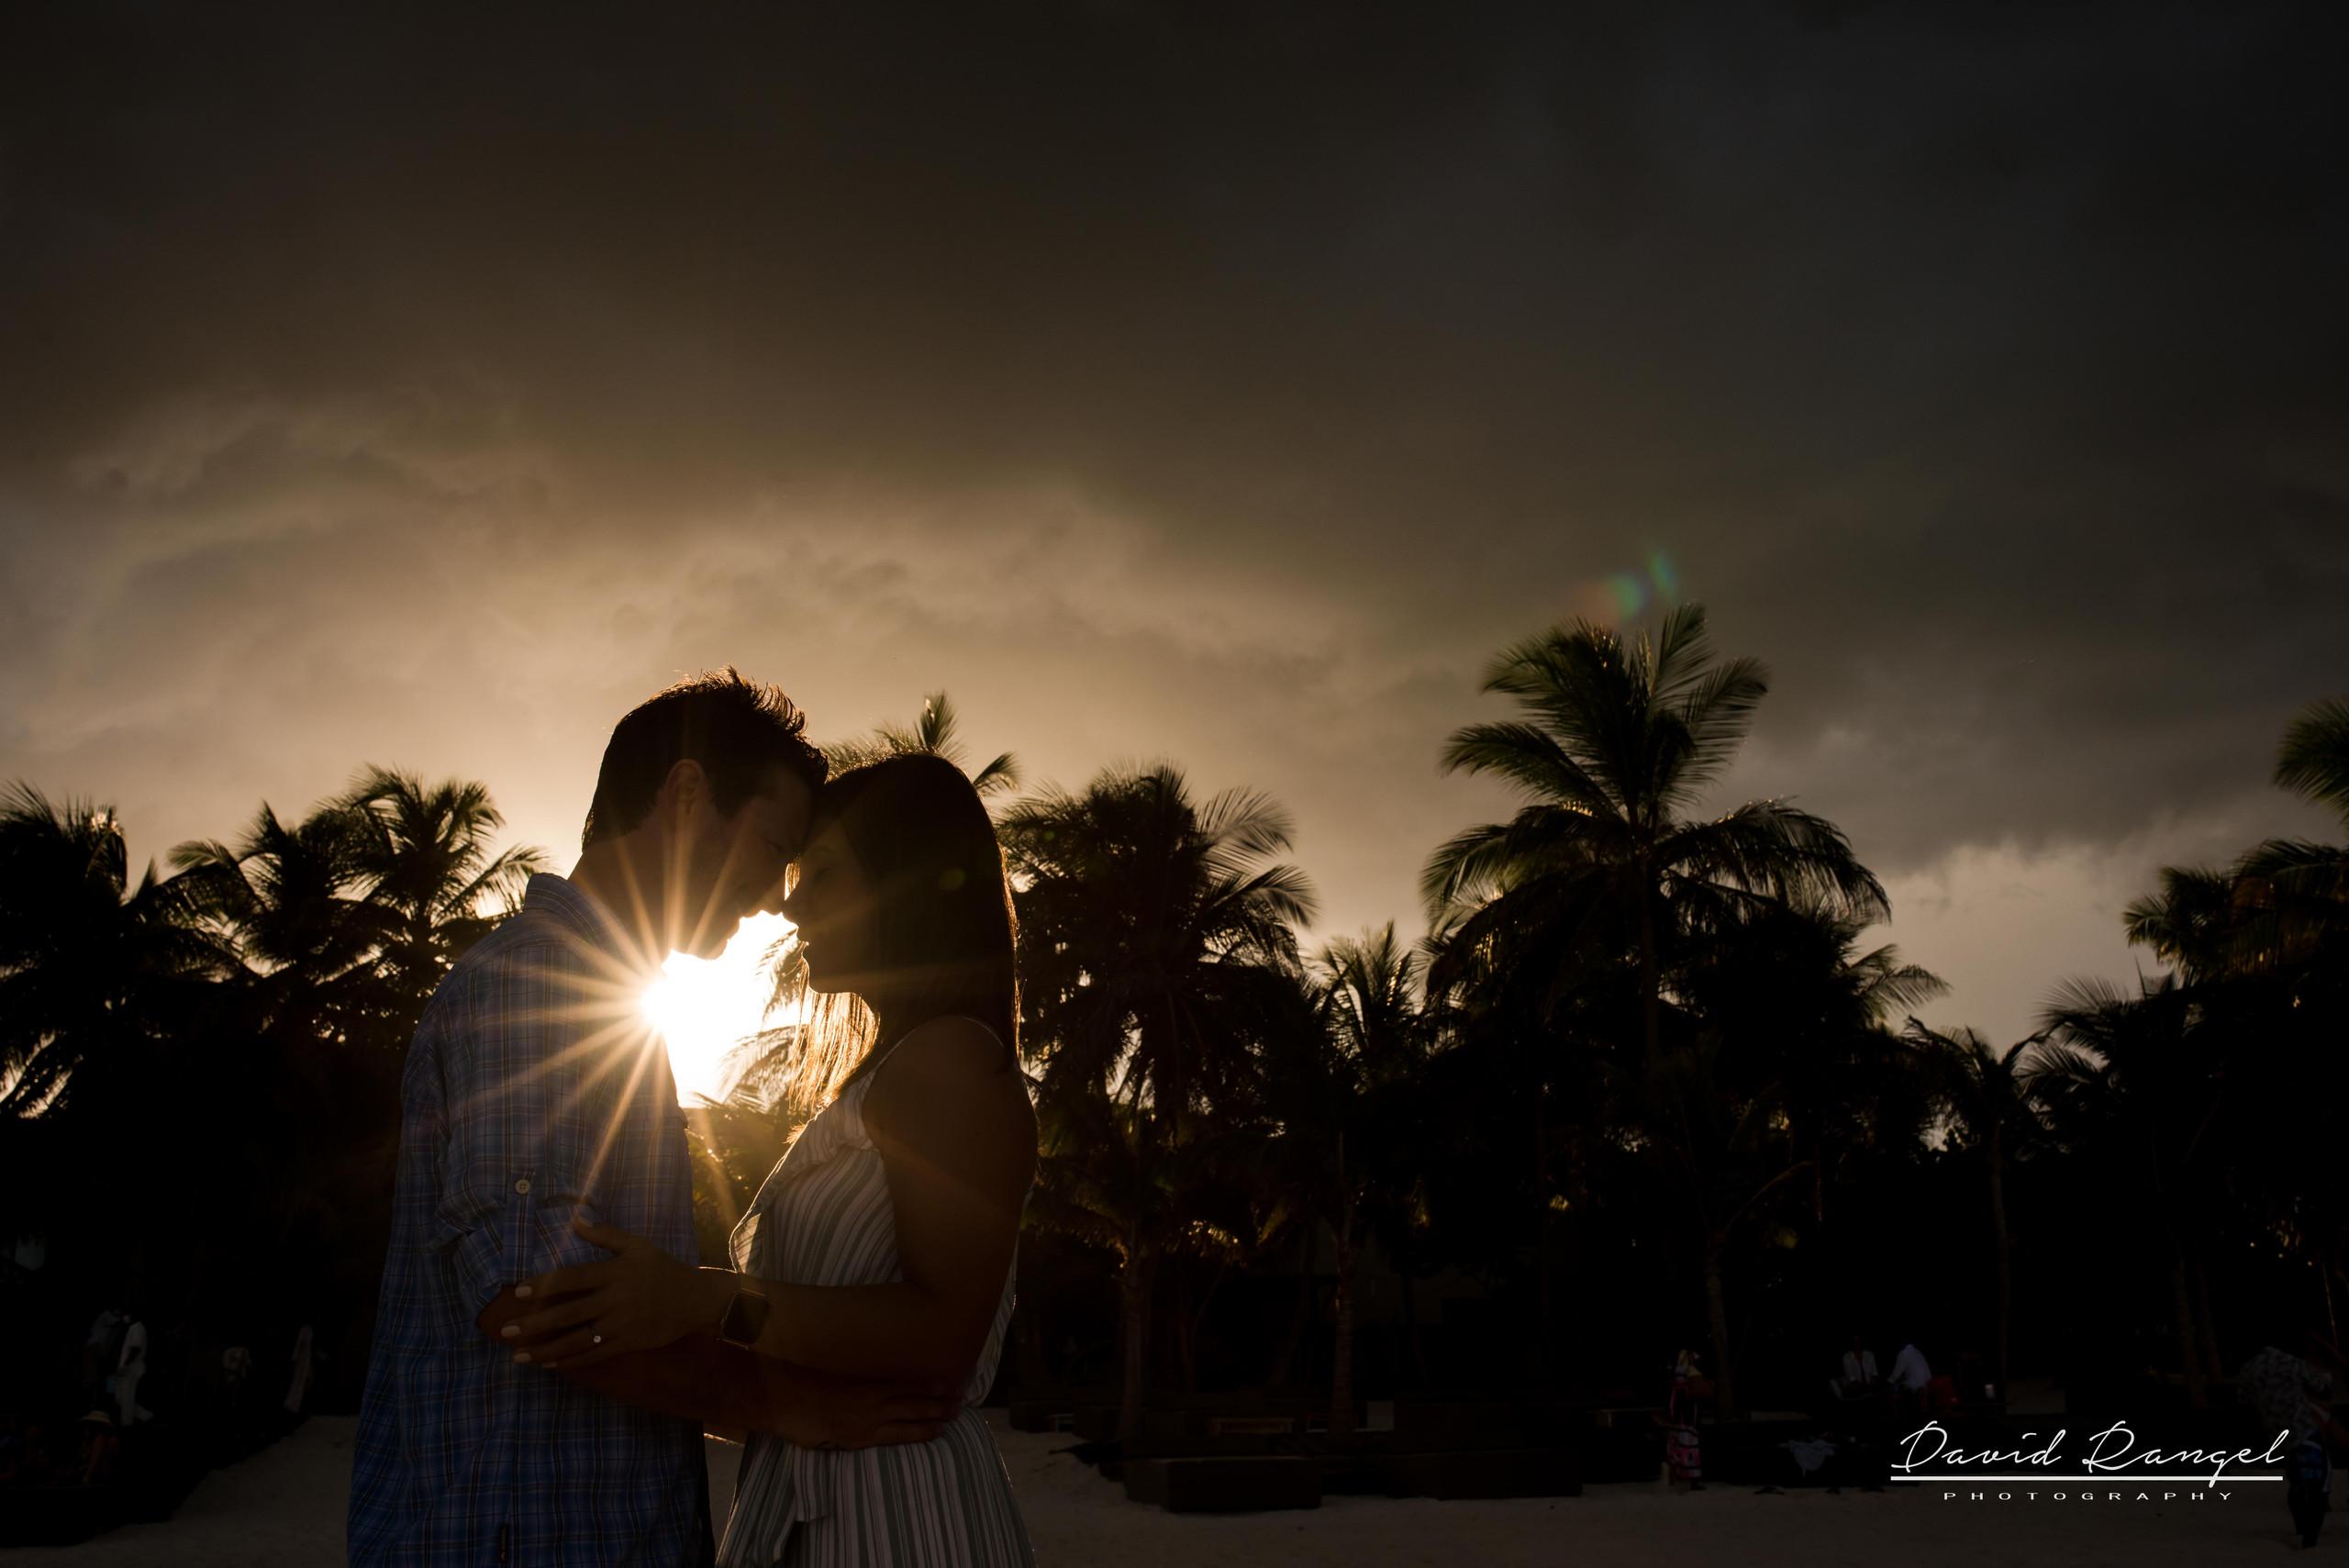 engagement+session+ring+sorprise+beach+vacations+casa+malca+hotel+pedida+de+mano+propuesta+de+matrimonio+pareja+amor+photo+boutique+sunset+shadows+backlight